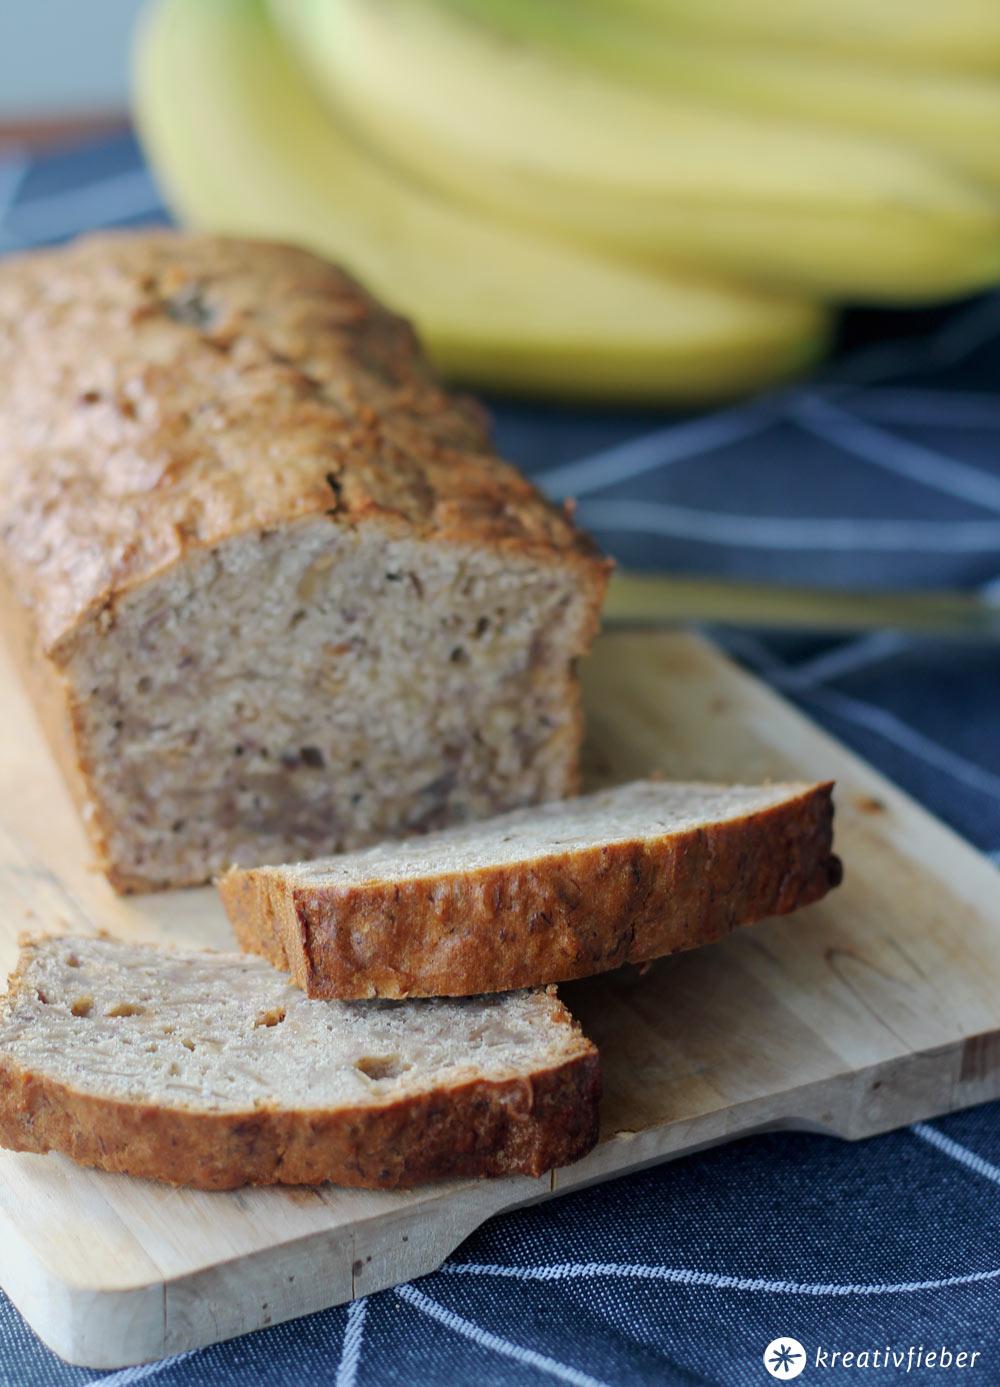 Bananen Nuss Brot Mit Honig Rezept